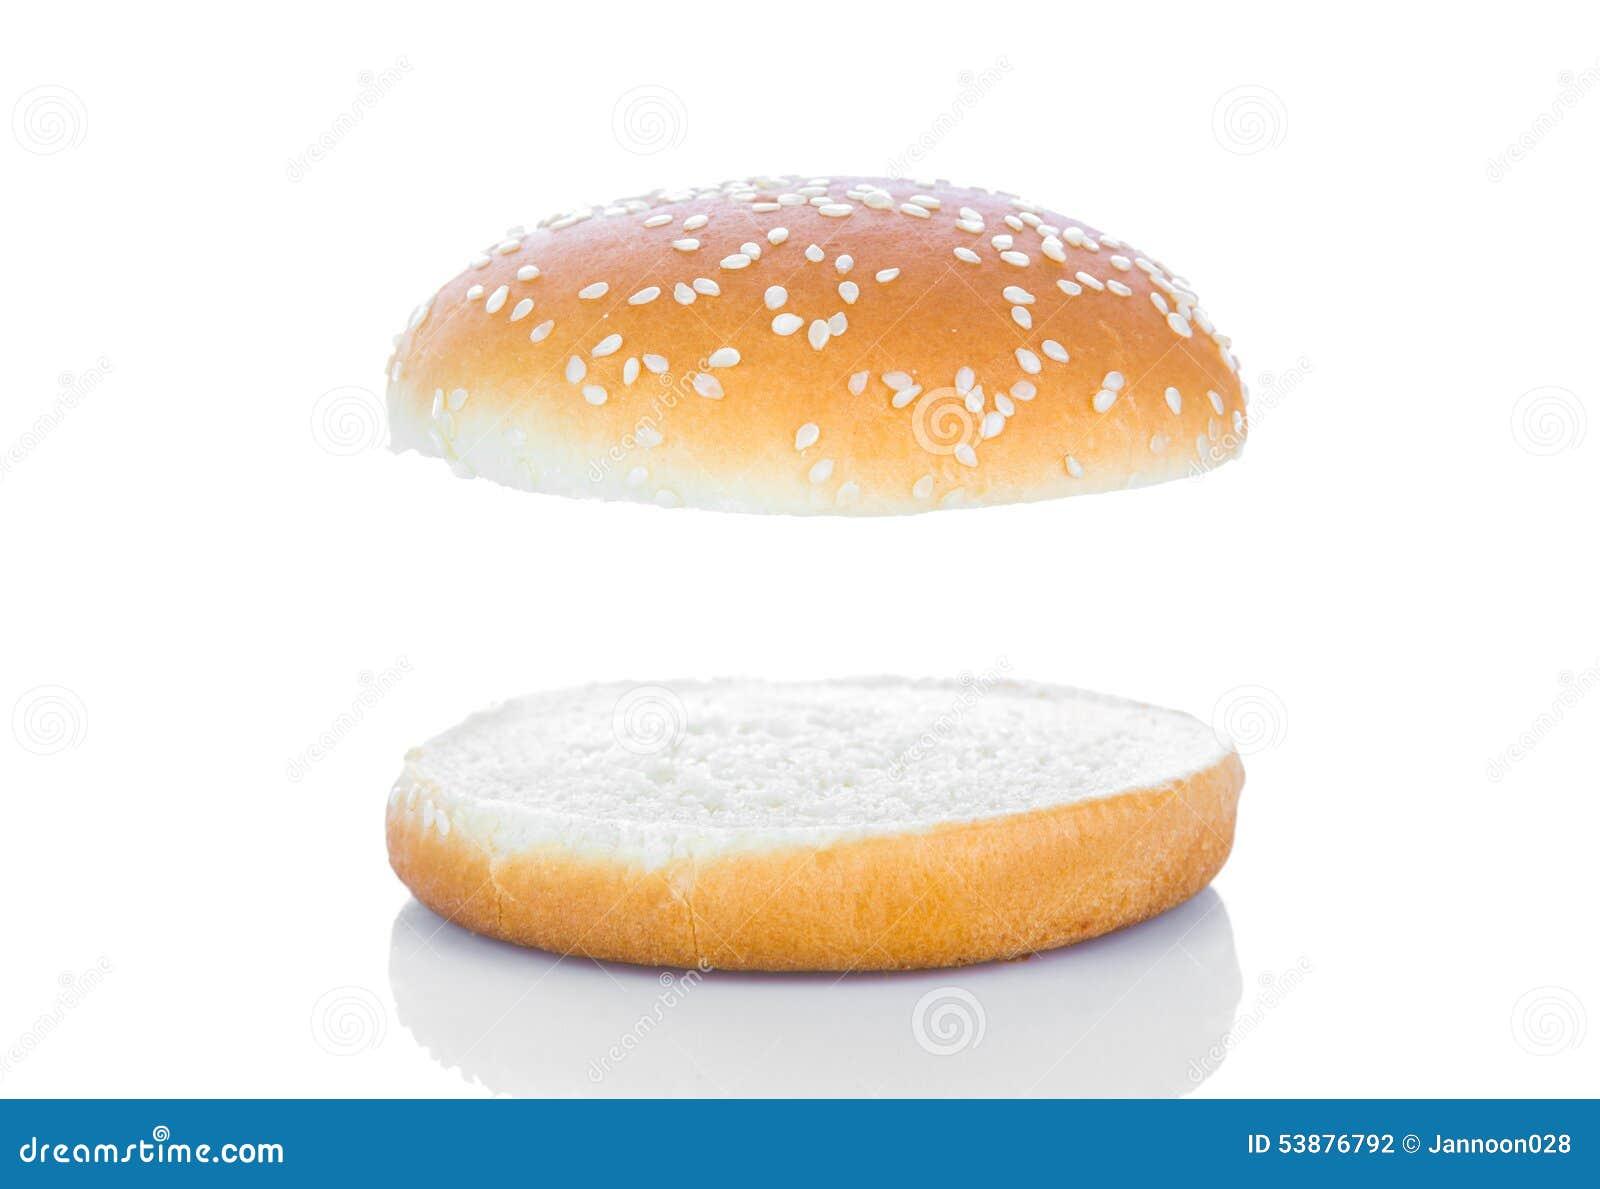 Hamburger Bun Stock Photo - Image: 53876792